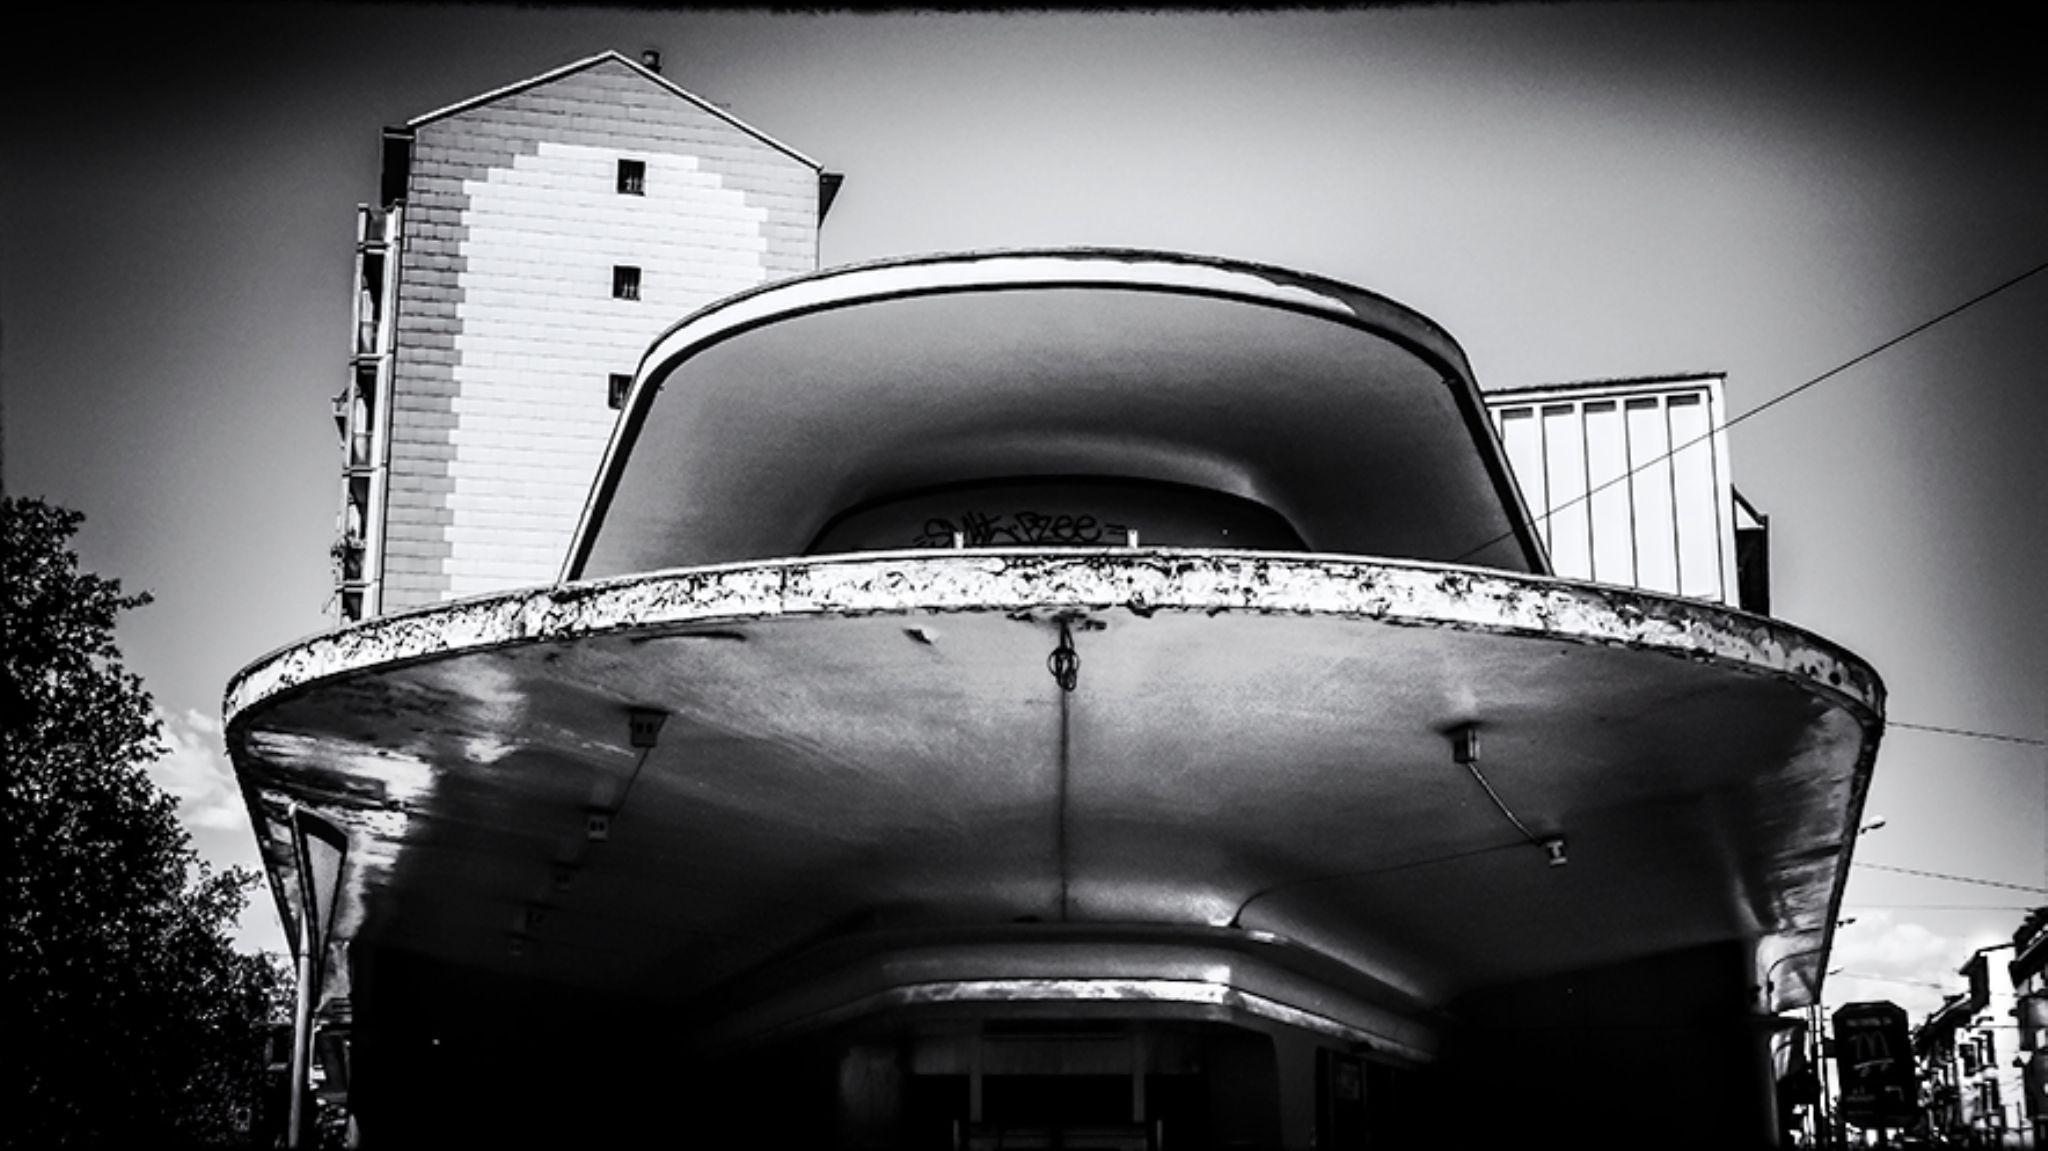 spaceship by claudio naboni